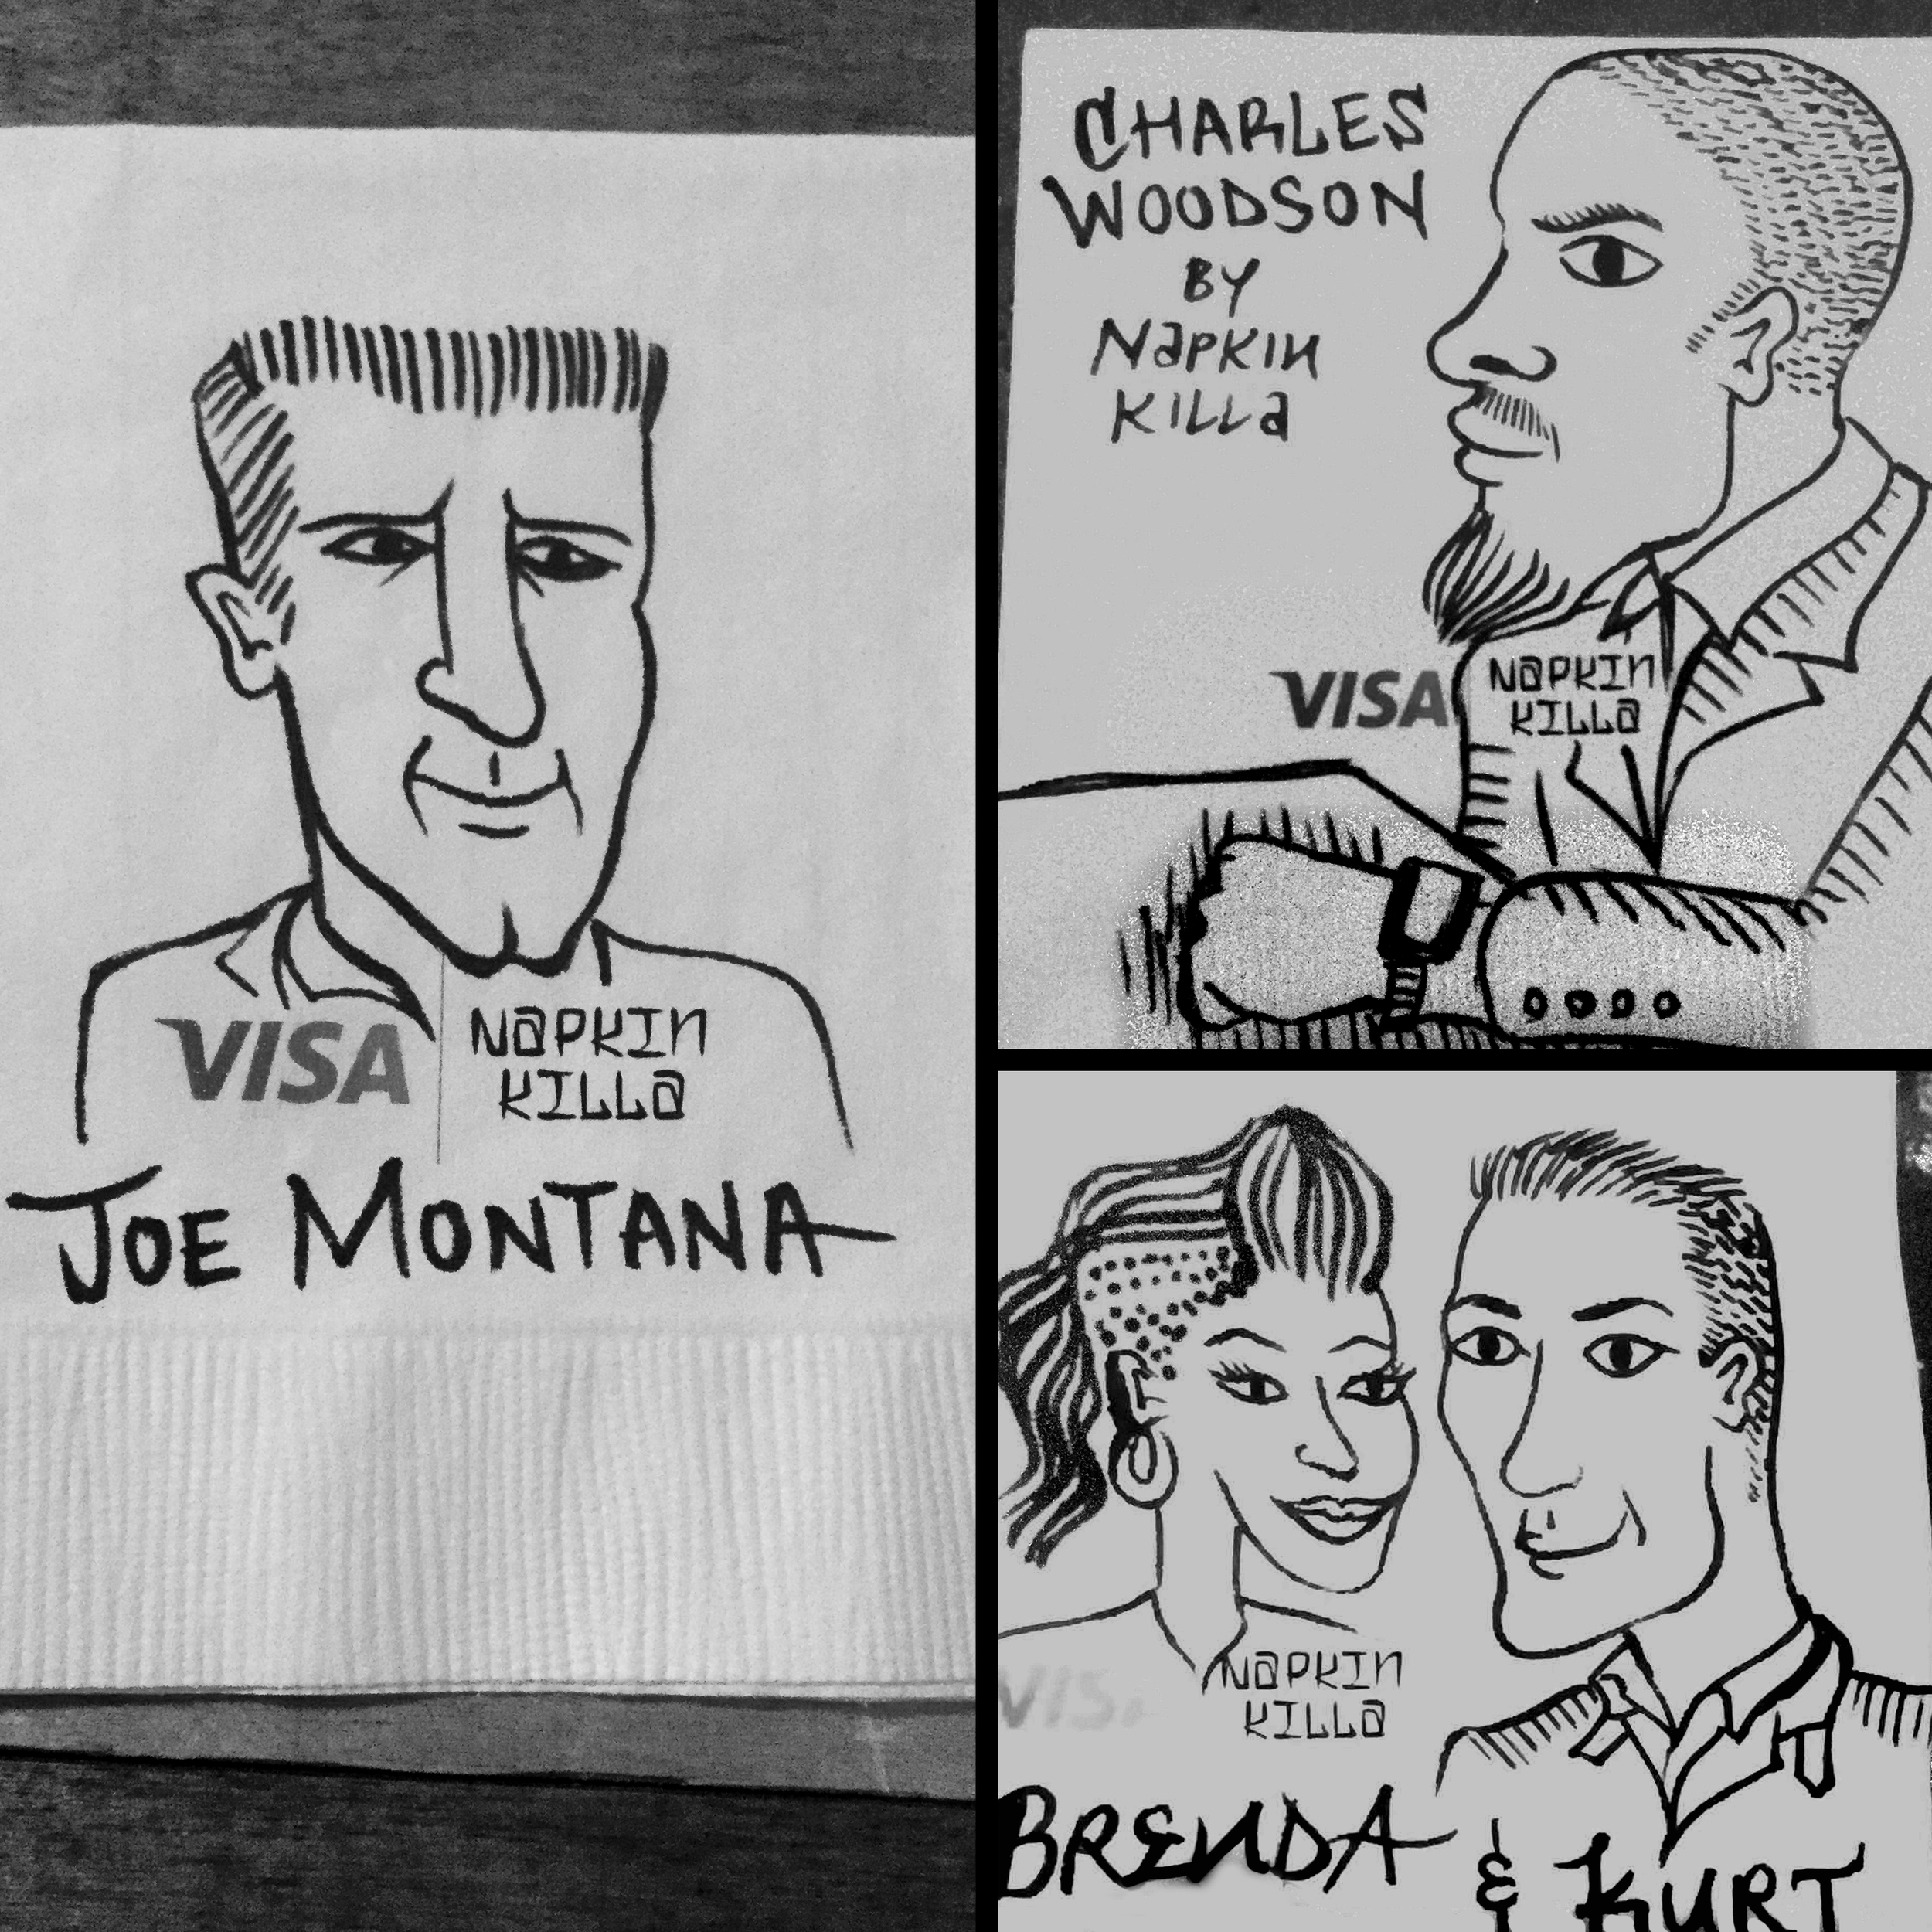 Montana_Woodson_Kurt.jpg